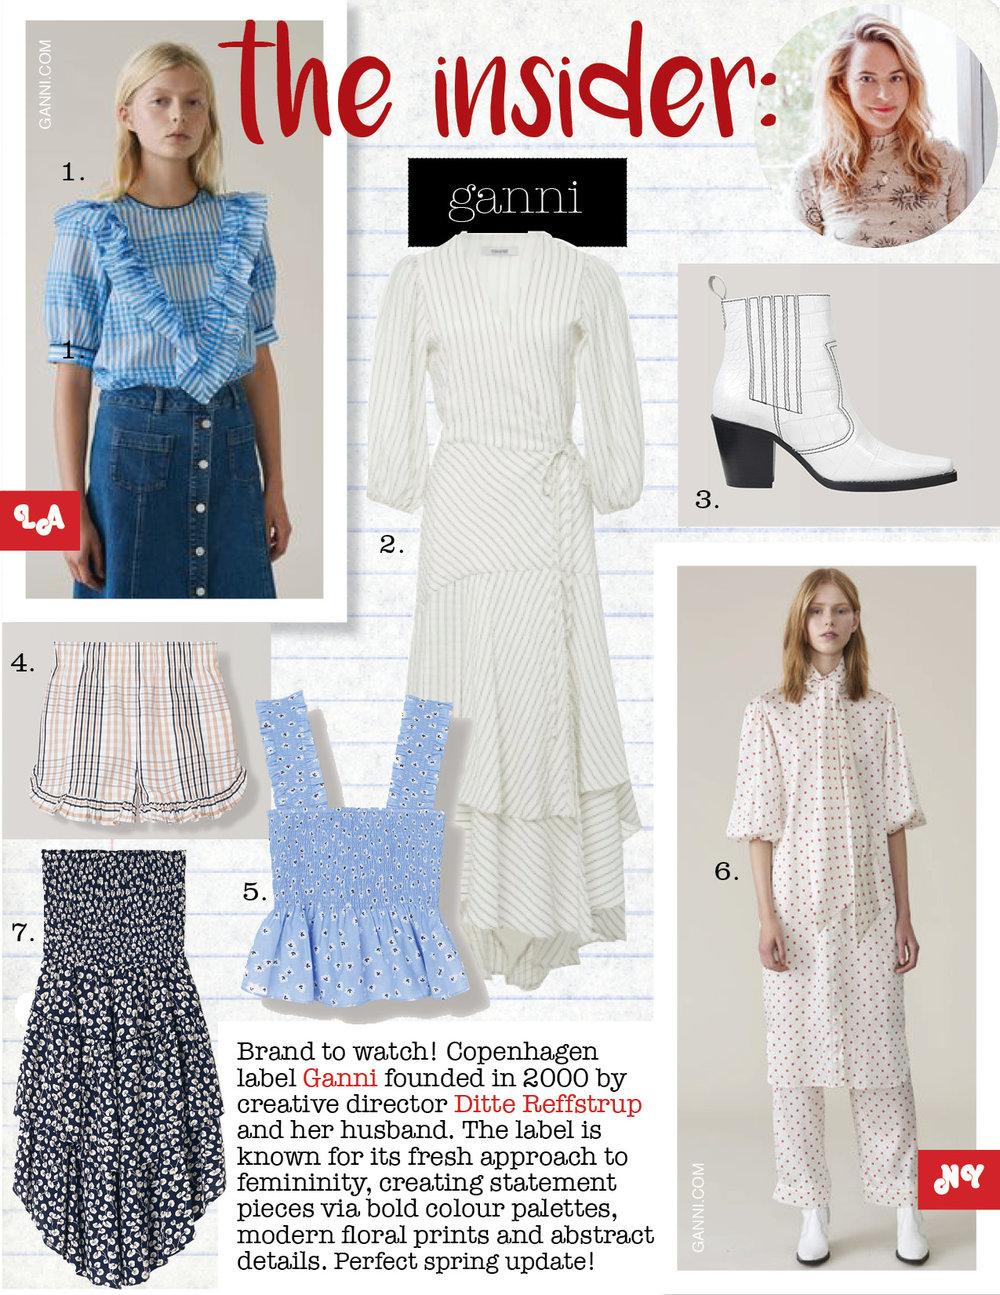 1. Ganni charron blouse, $170,  ganni.com  2. ganni wilkie seersucker wrap dress, $675,  ganni.com  3. ganni callie ankle boots, $475,  ganni.com  4. ganni phillips cotton shorts, $125,  ganni.com  5. ganni beacon top, $145,  ganni.com  6. ganni dufort silk dress, $475,  ganni.com  7. ganni roseburg crepe skirt, $205,  ganni.com